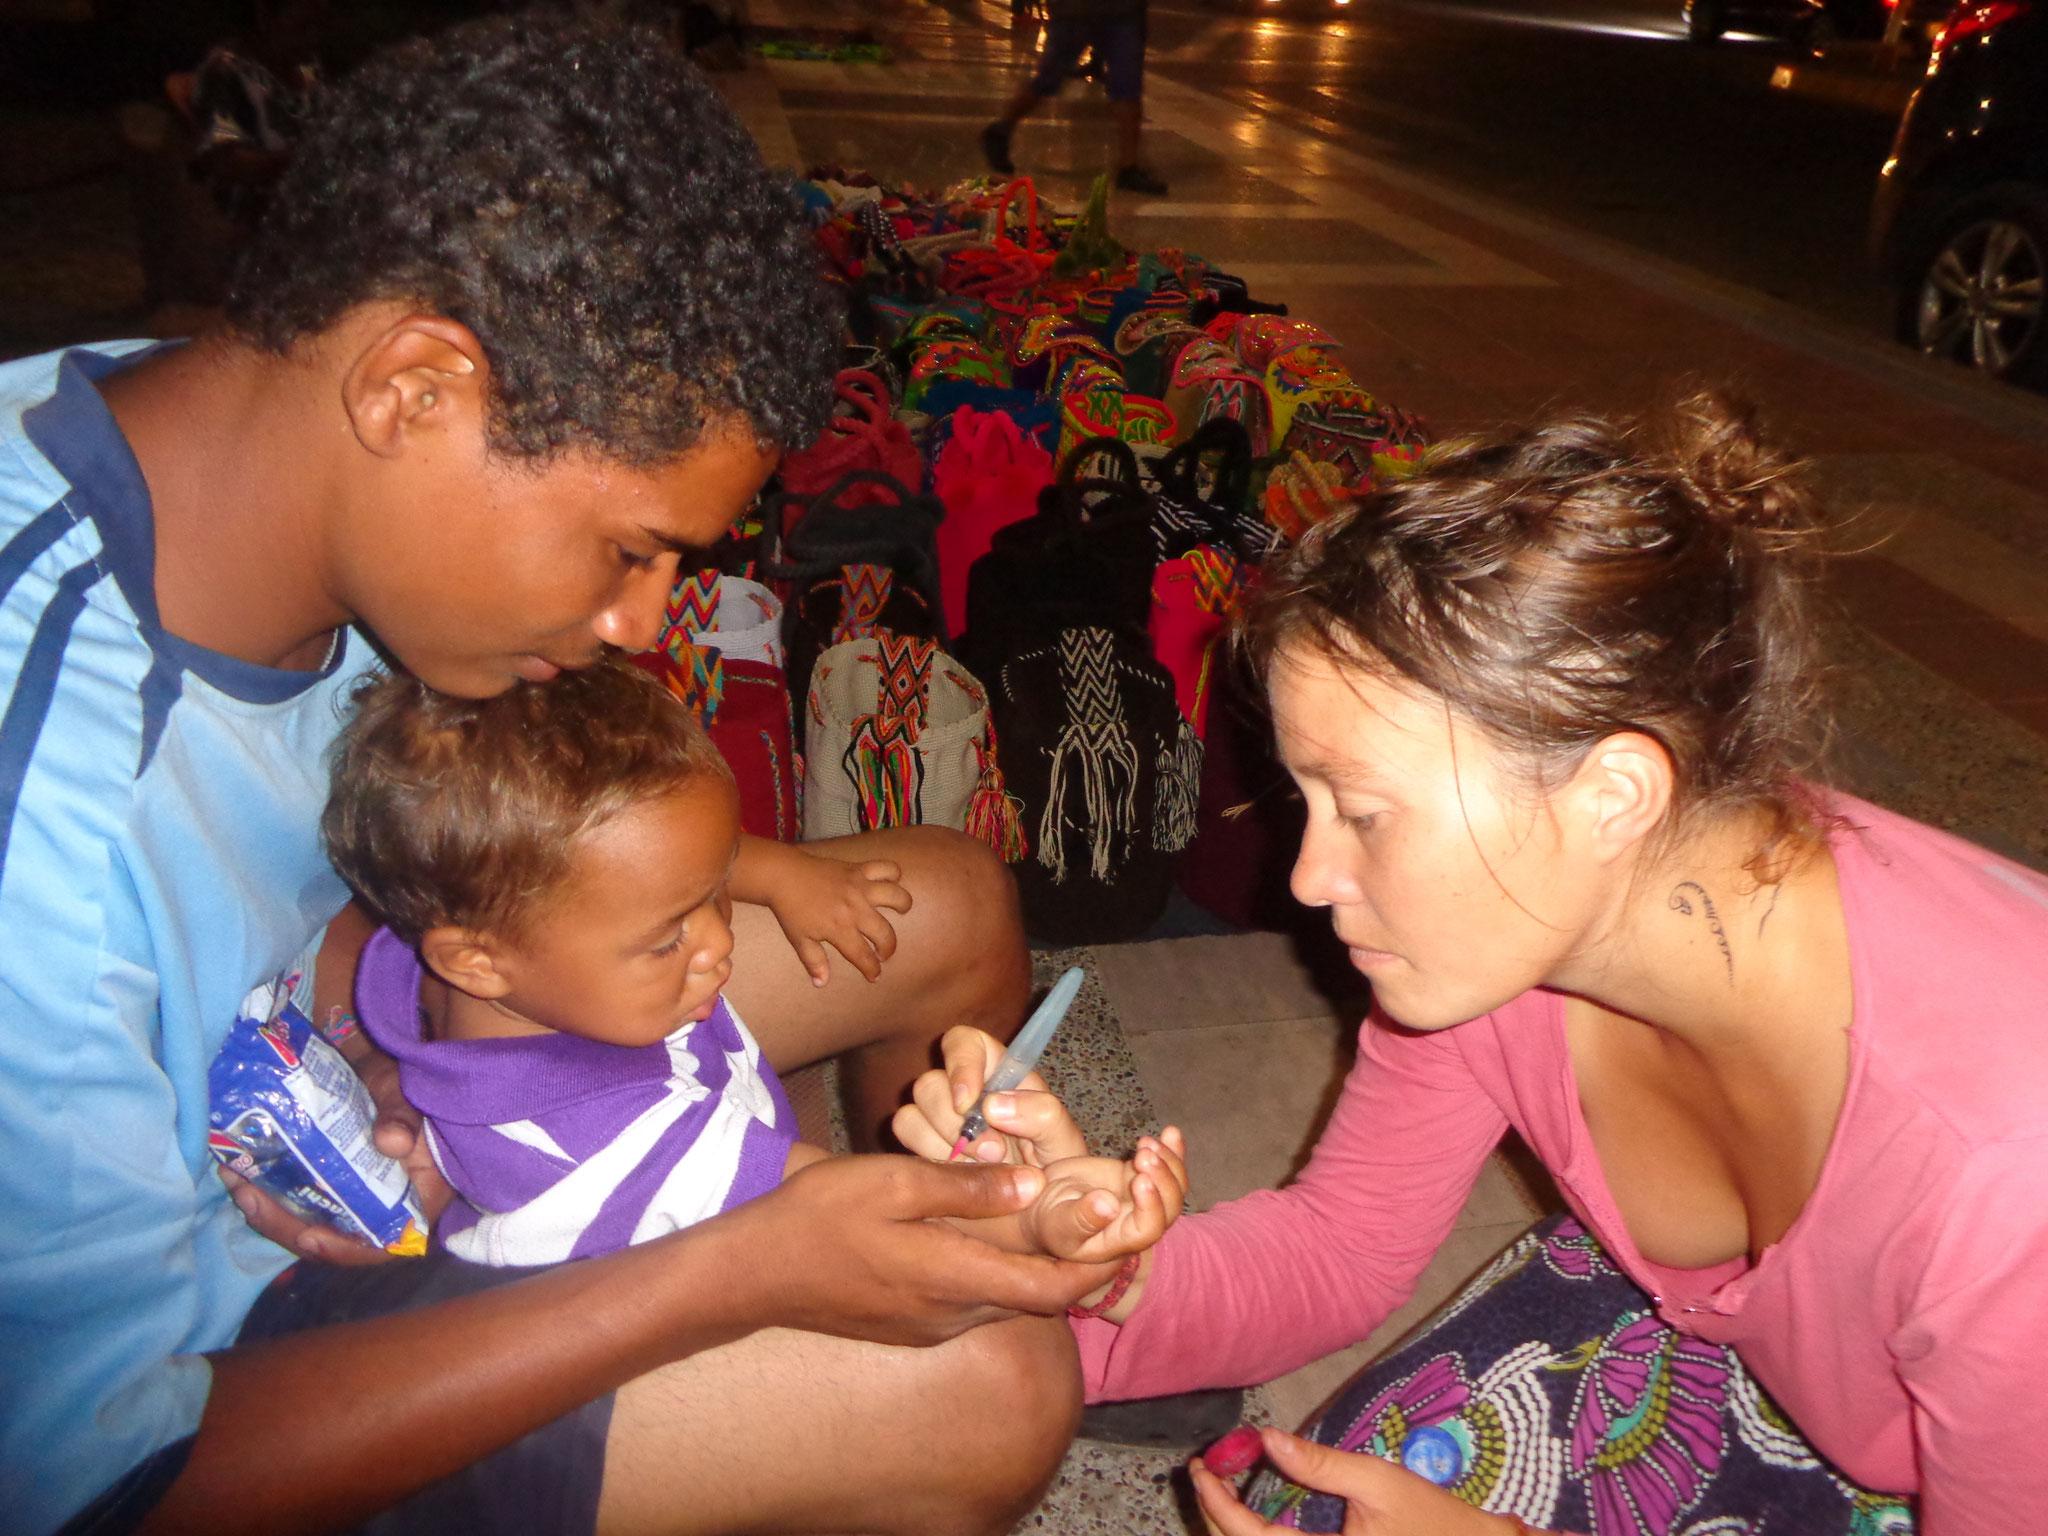 Maquillage aux petits colombiens